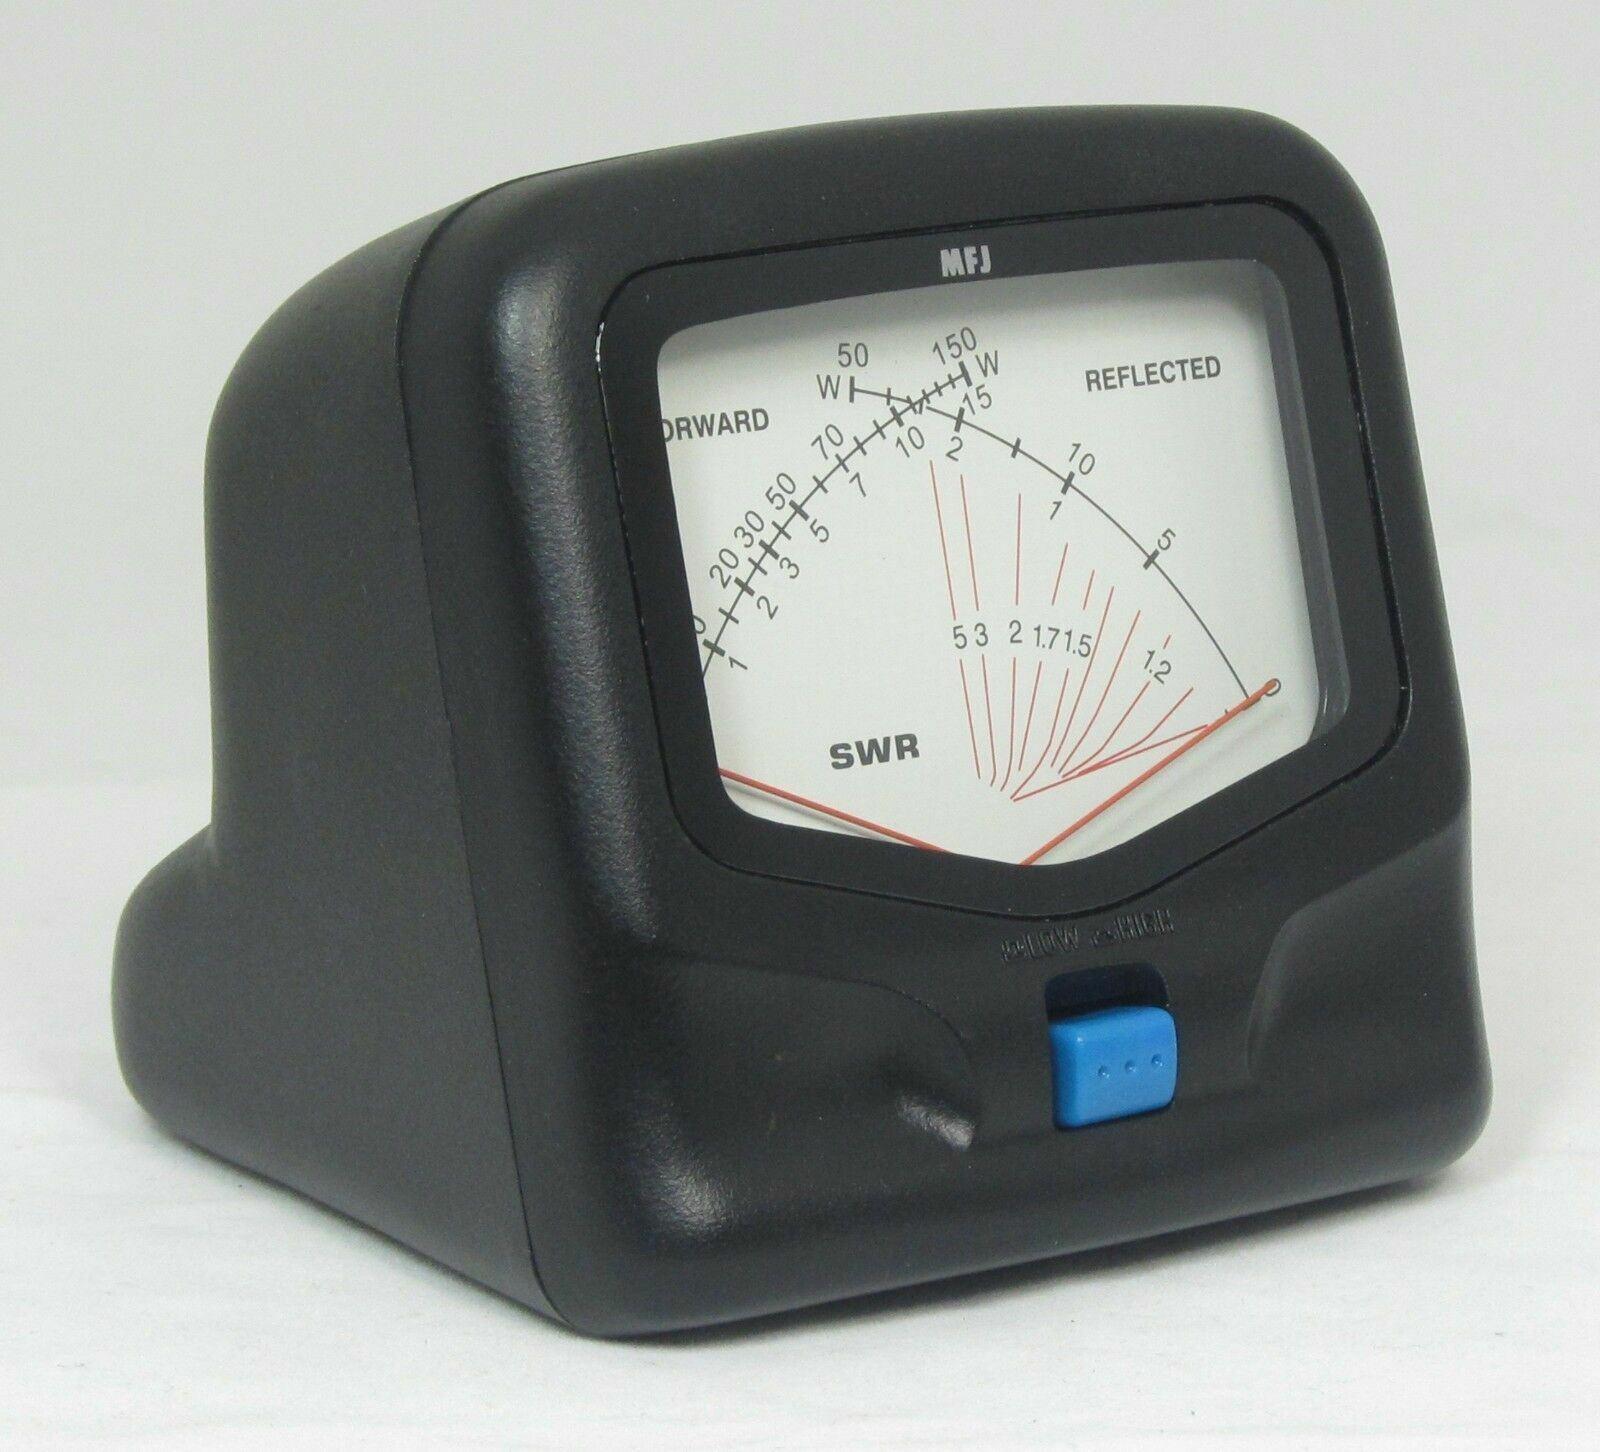 MFJ-822 r.w.antennastore MFJ-822 HF/VHF SWR/Wattmeter - 1.8 to 200 MHz 30/300 Watts. Base mobile ham